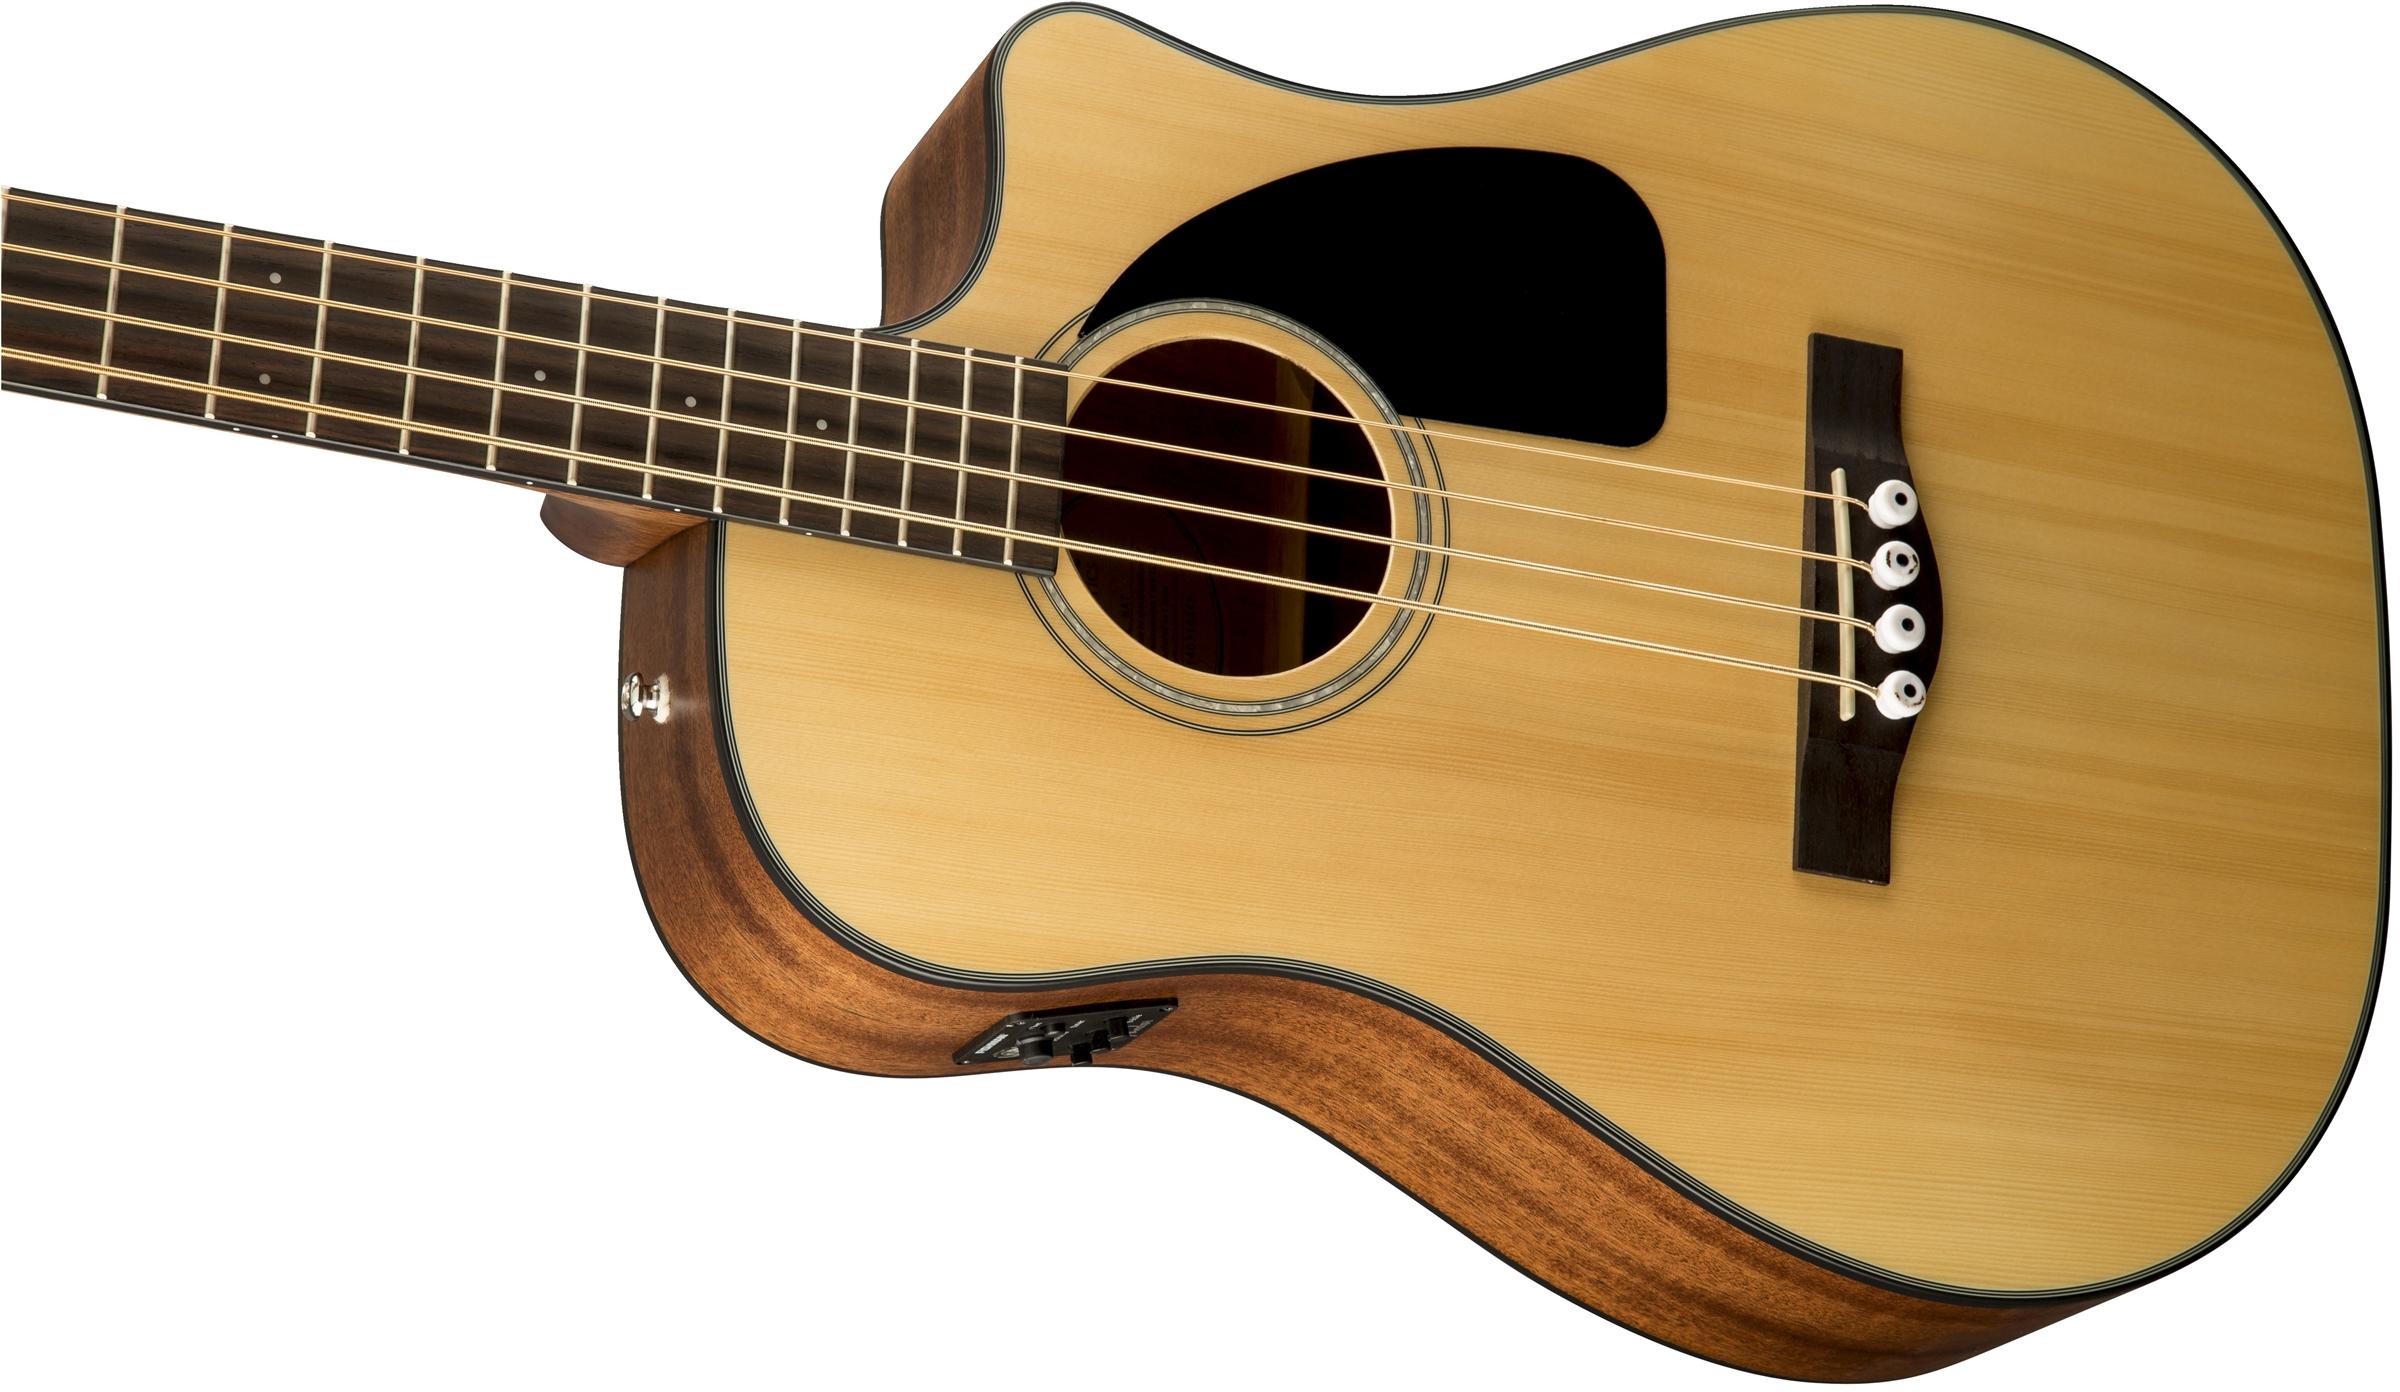 cb 100ce bass fender acoustic bass guitars. Black Bedroom Furniture Sets. Home Design Ideas